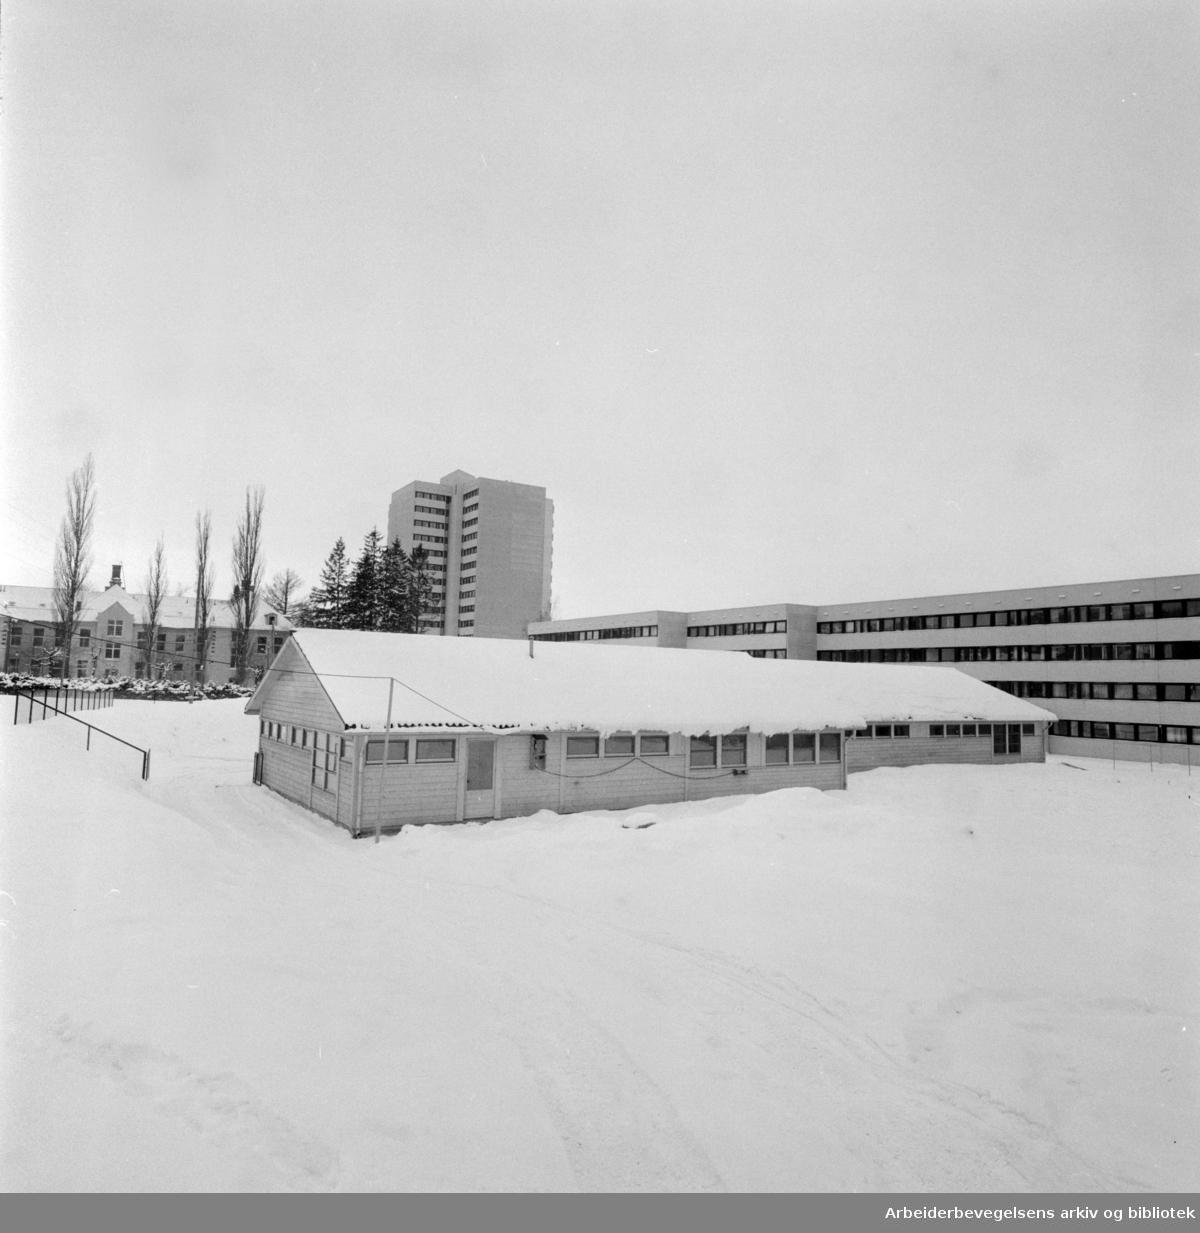 Trosterud. Stubberudlia barnehage. Februar 1976